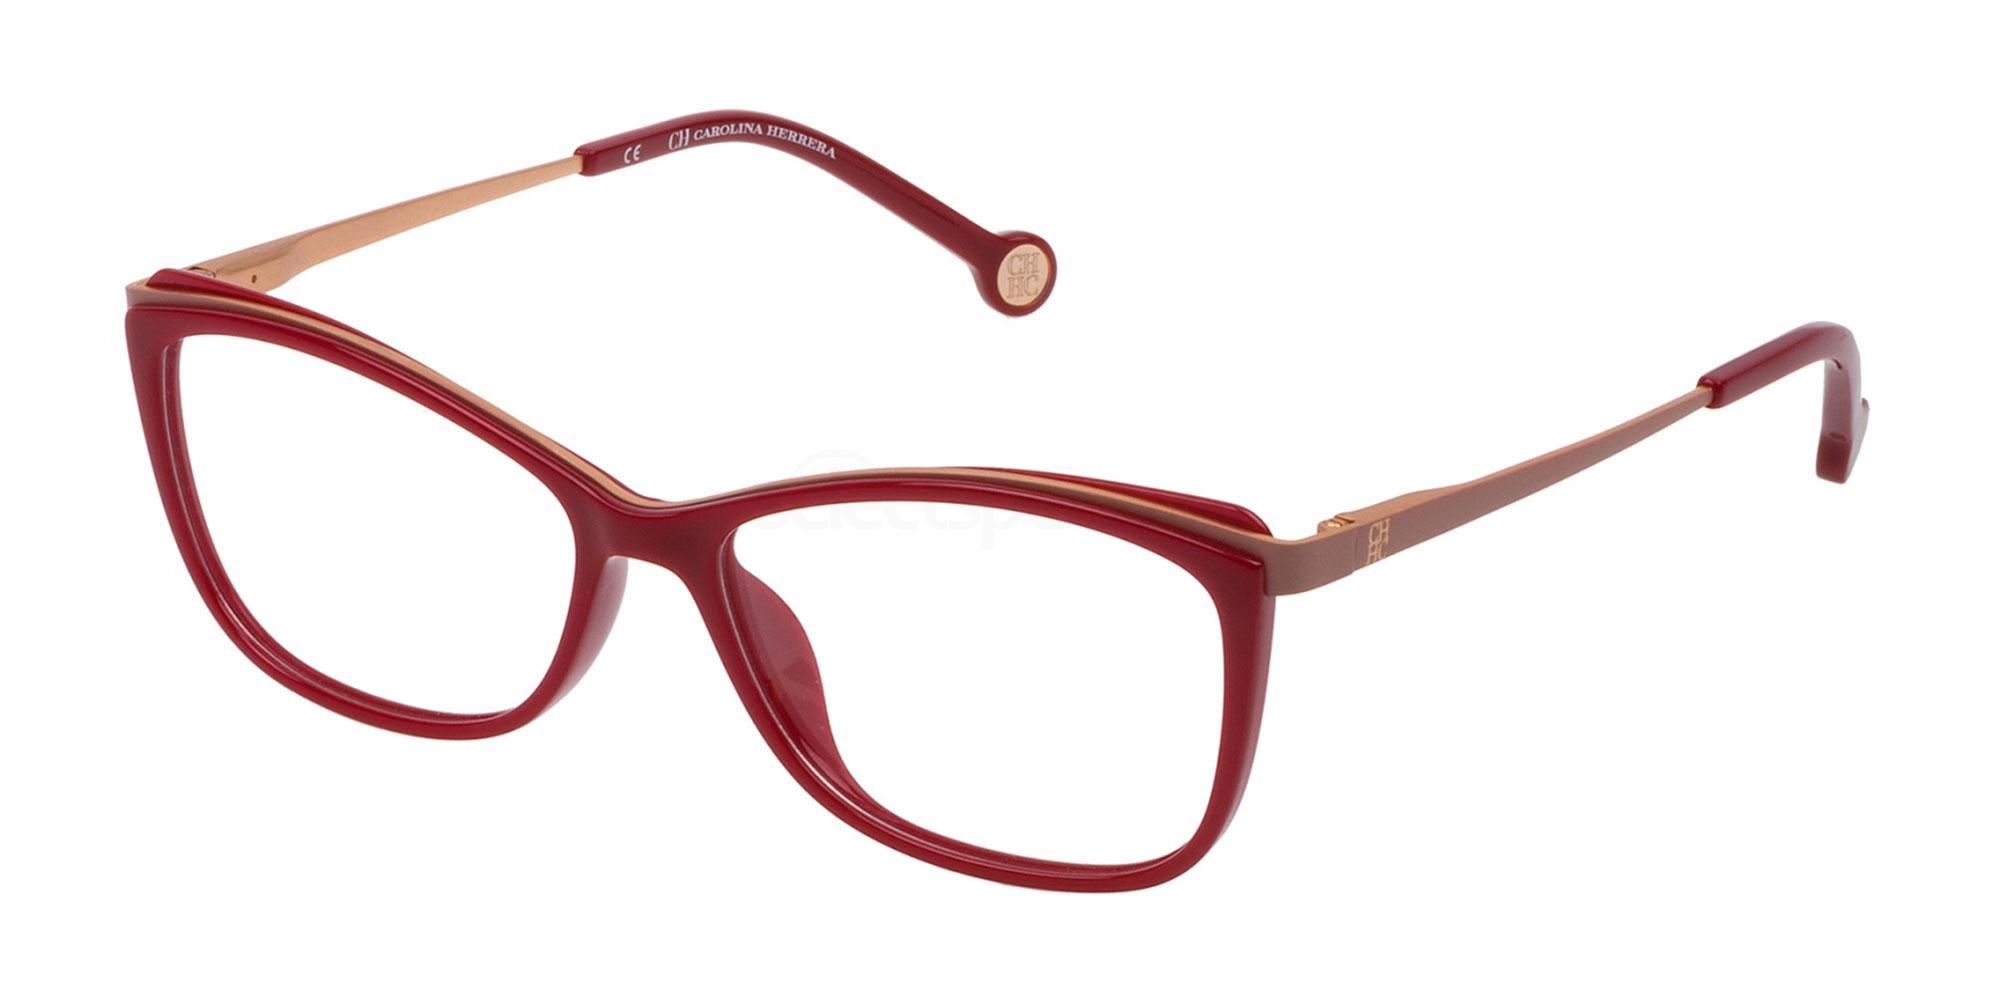 01AW VHE782 Glasses, CH Carolina Herrera